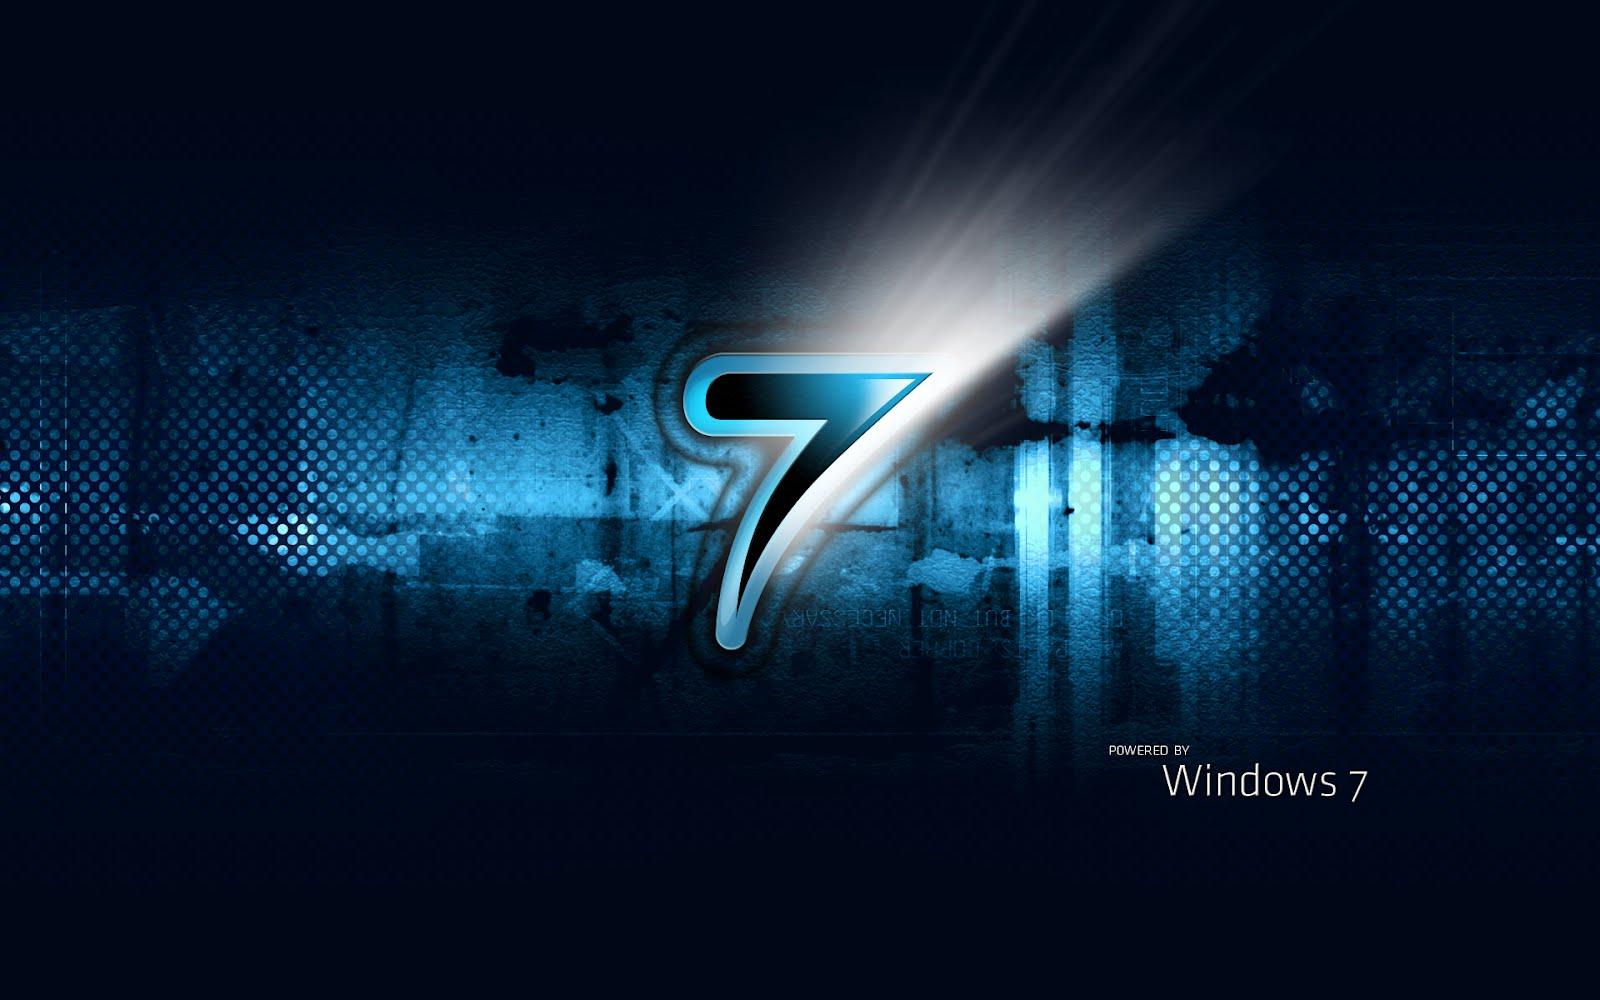 Hd wallpaper untuk android wallpaper windows 7 wallpaper free voltagebd Choice Image